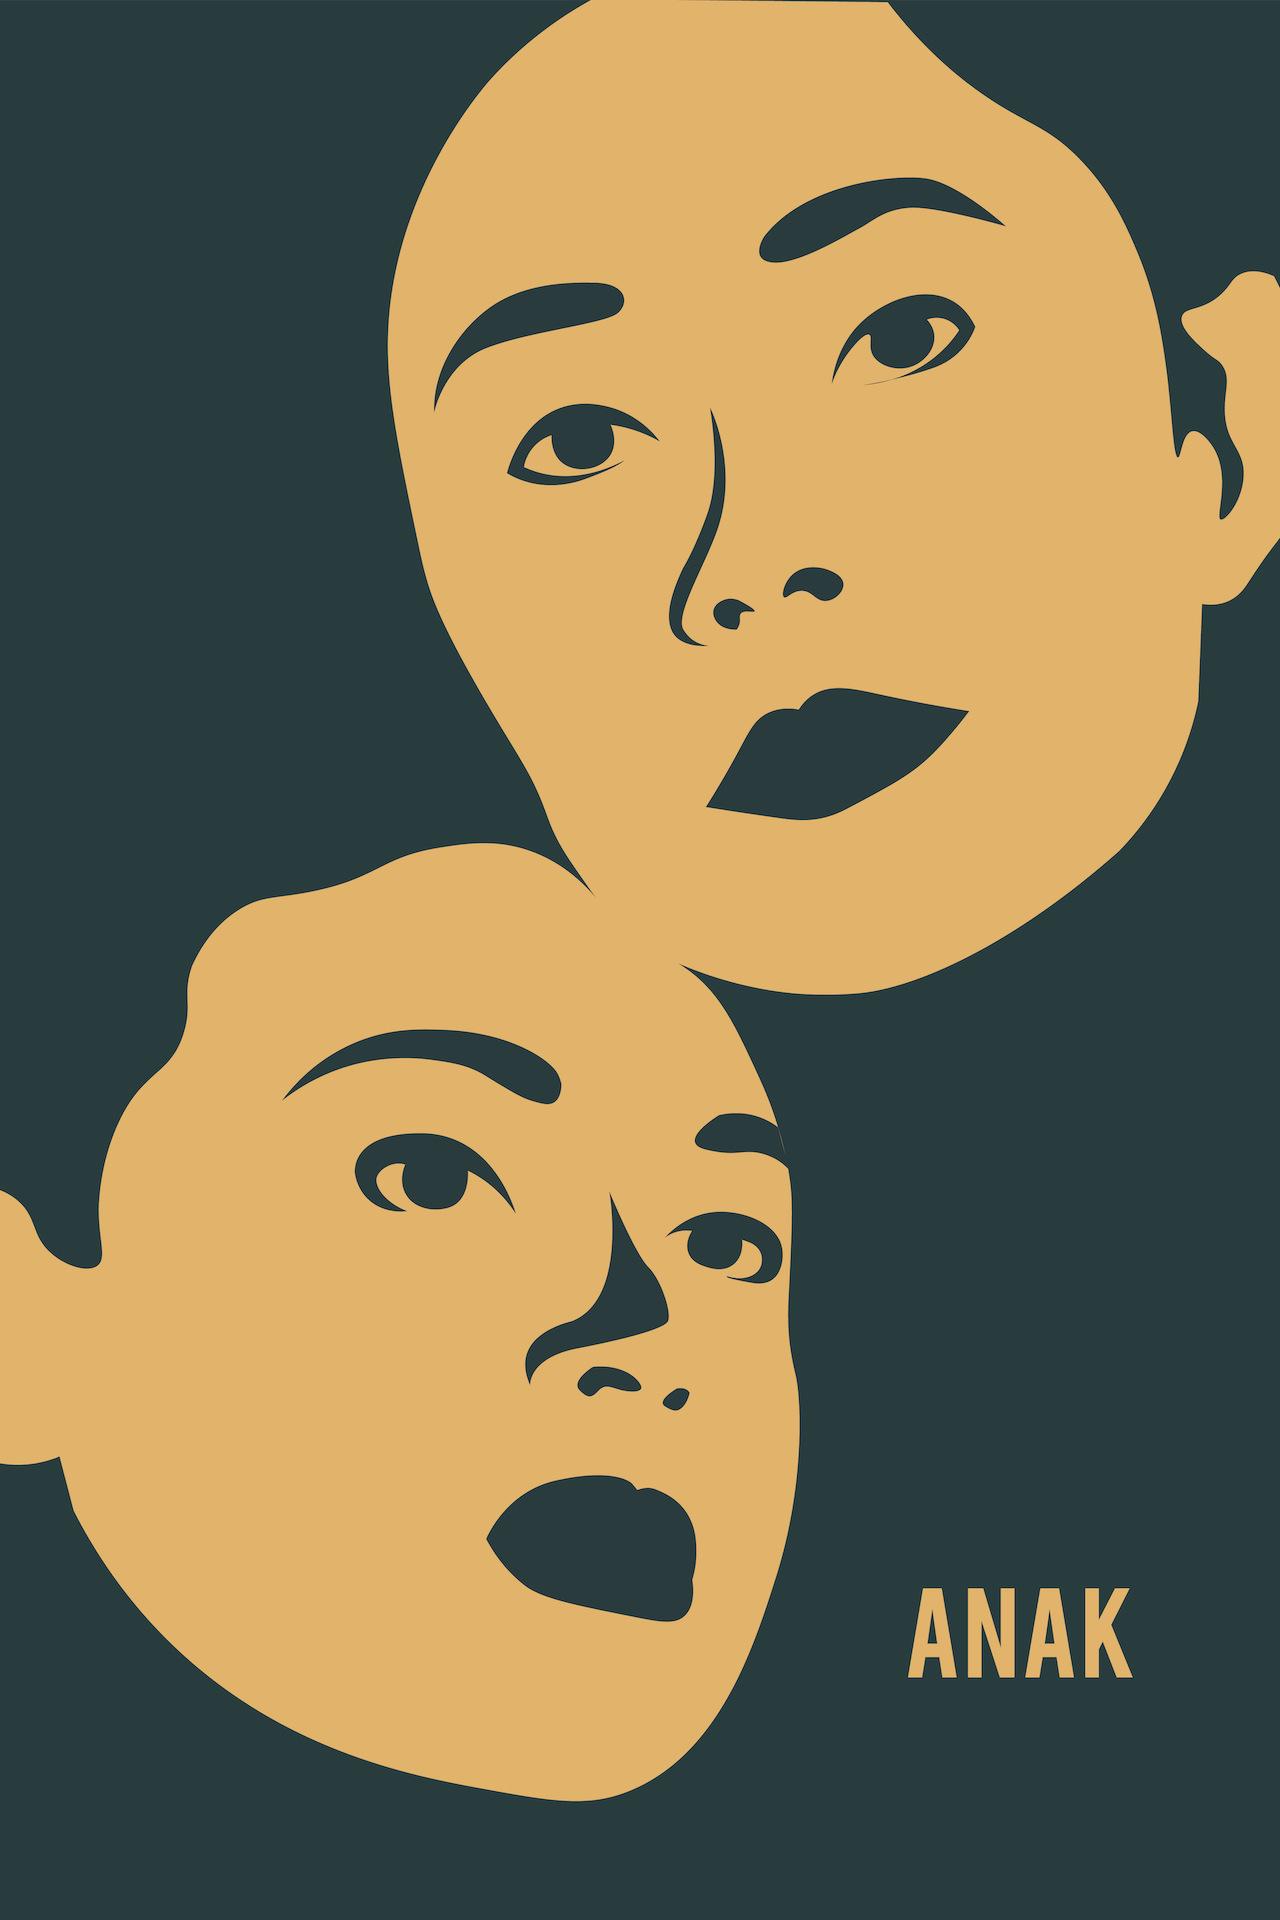 Anak starring Vilma Santos,  illustration by Isabela Ferrer